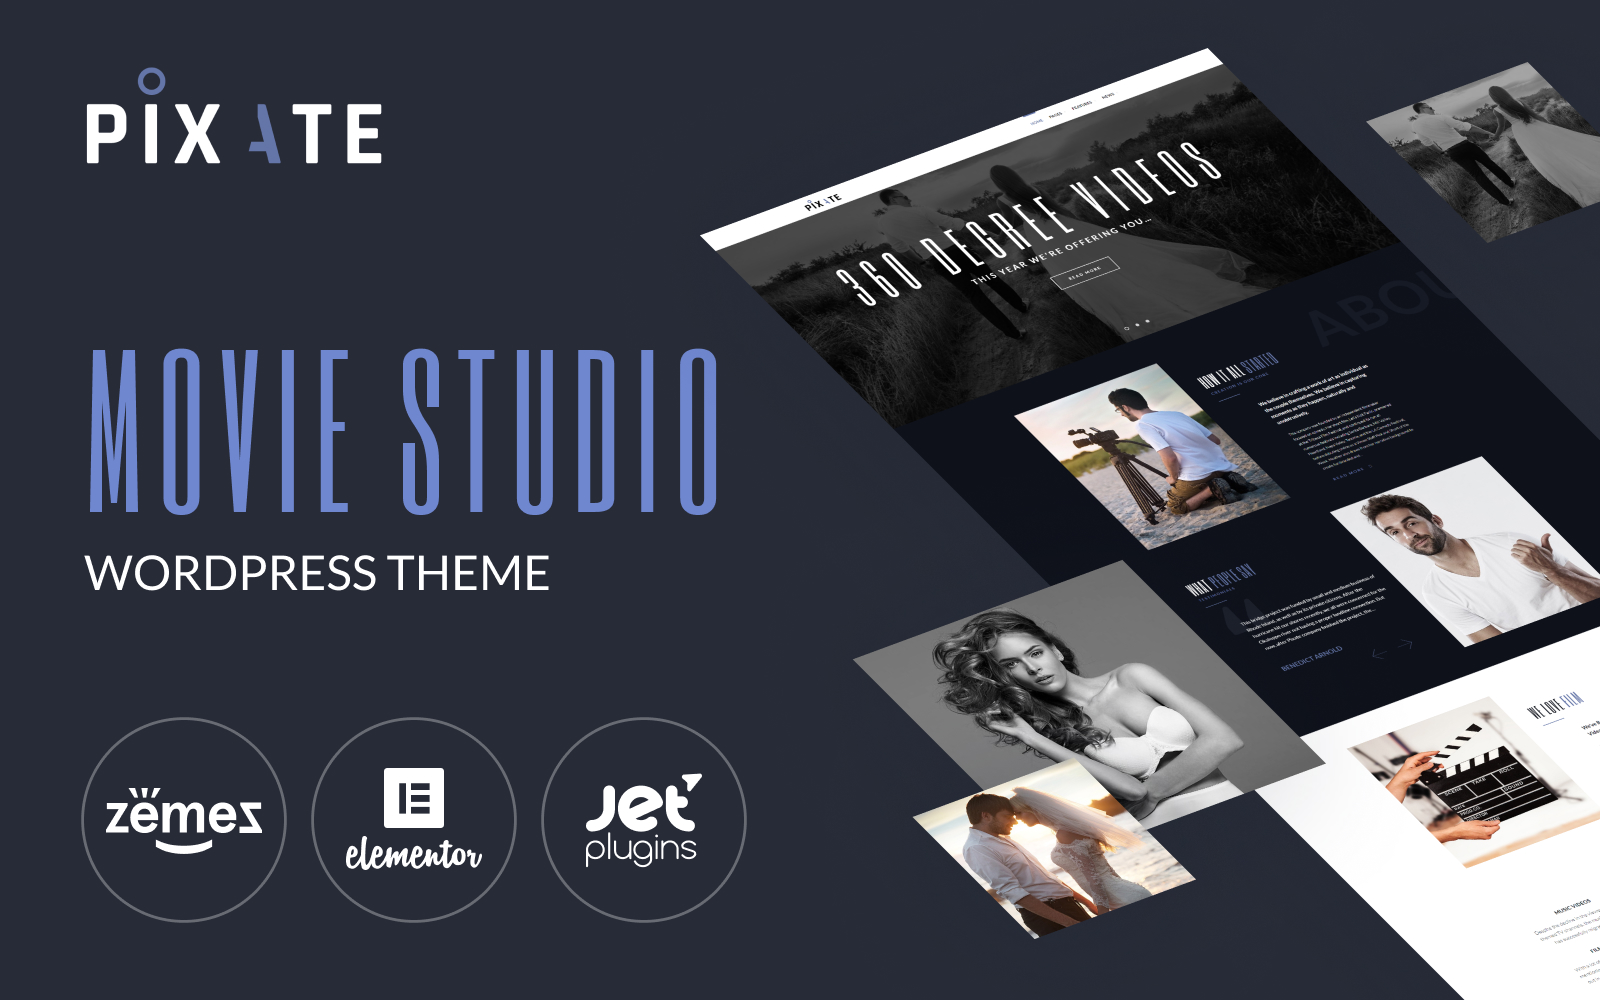 Reszponzív Pixate - Movie Studio WordPress Theme WordPress sablon 65159